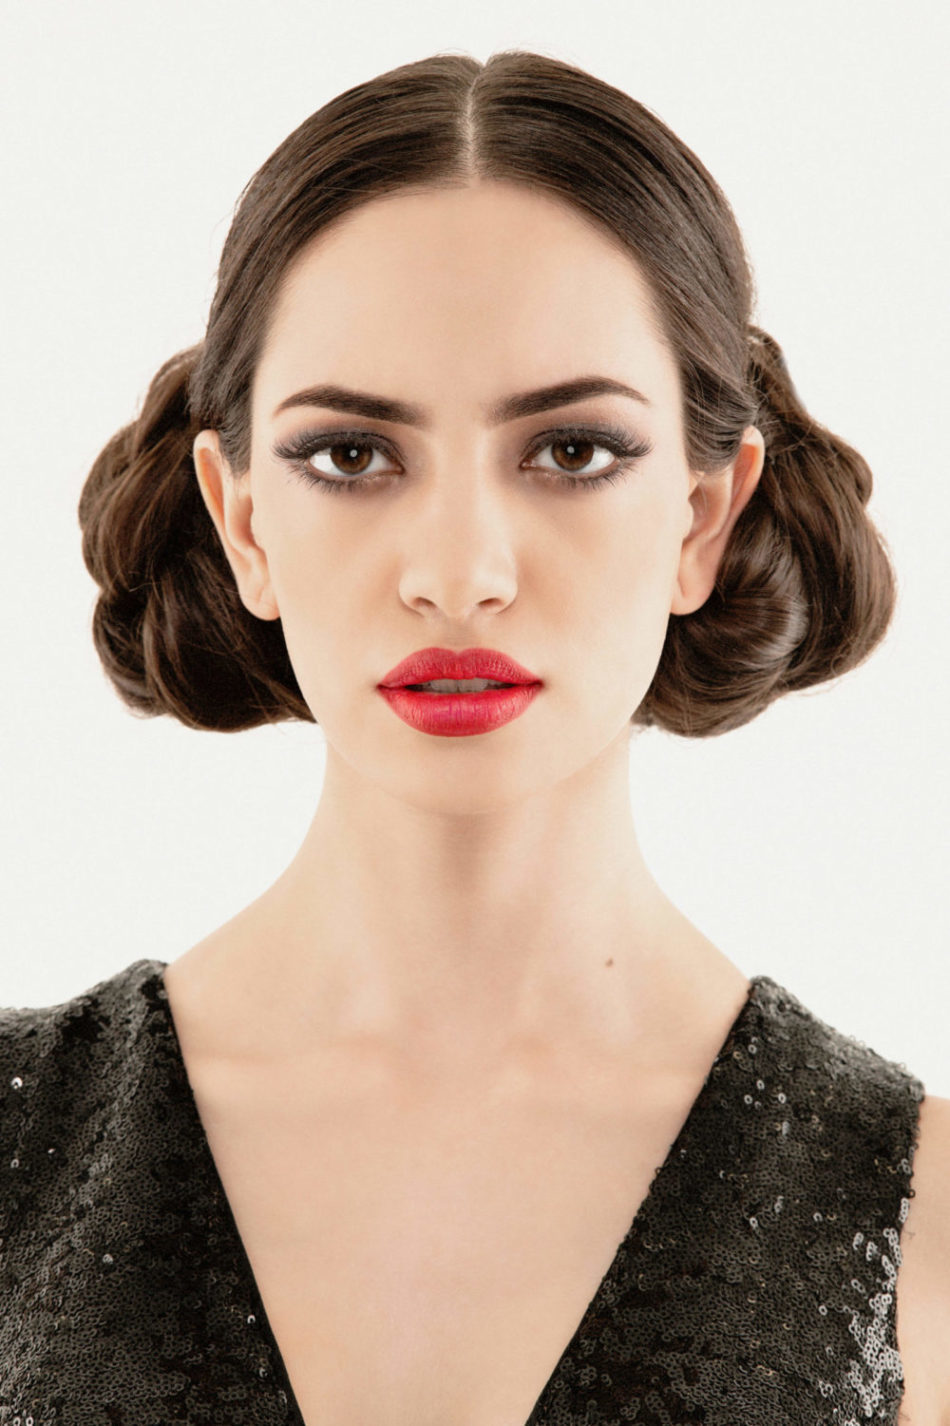 Beauty Make-up 9